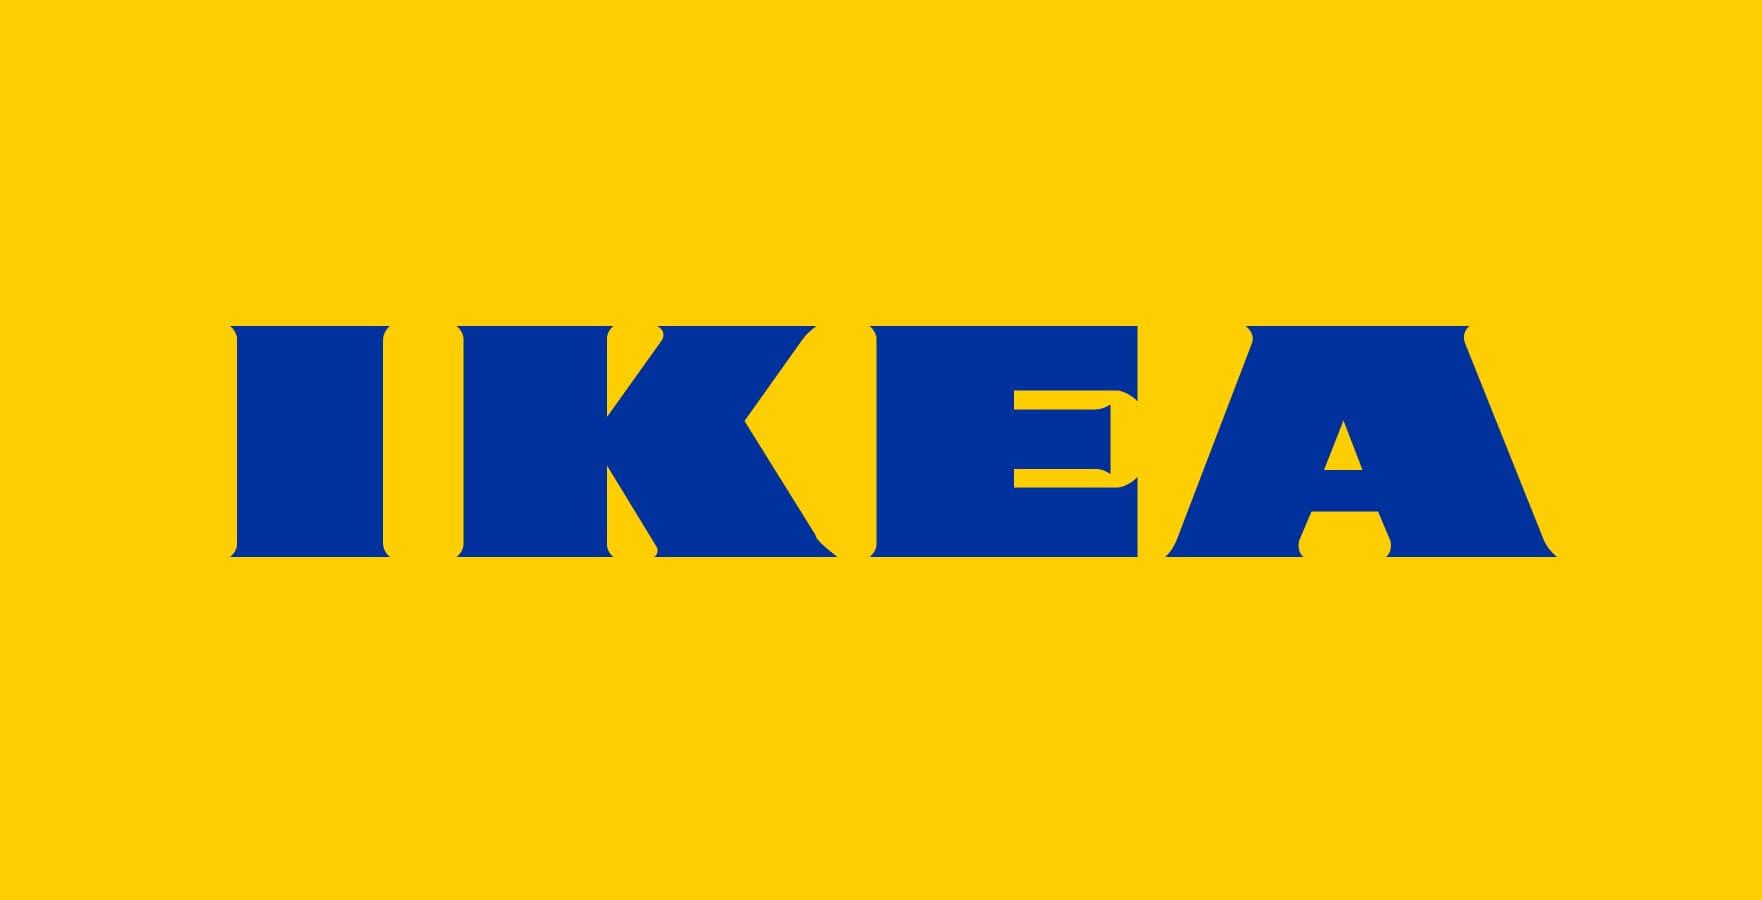 Ikea Swot Analysis | Retail furniture Brand Swot Analysis